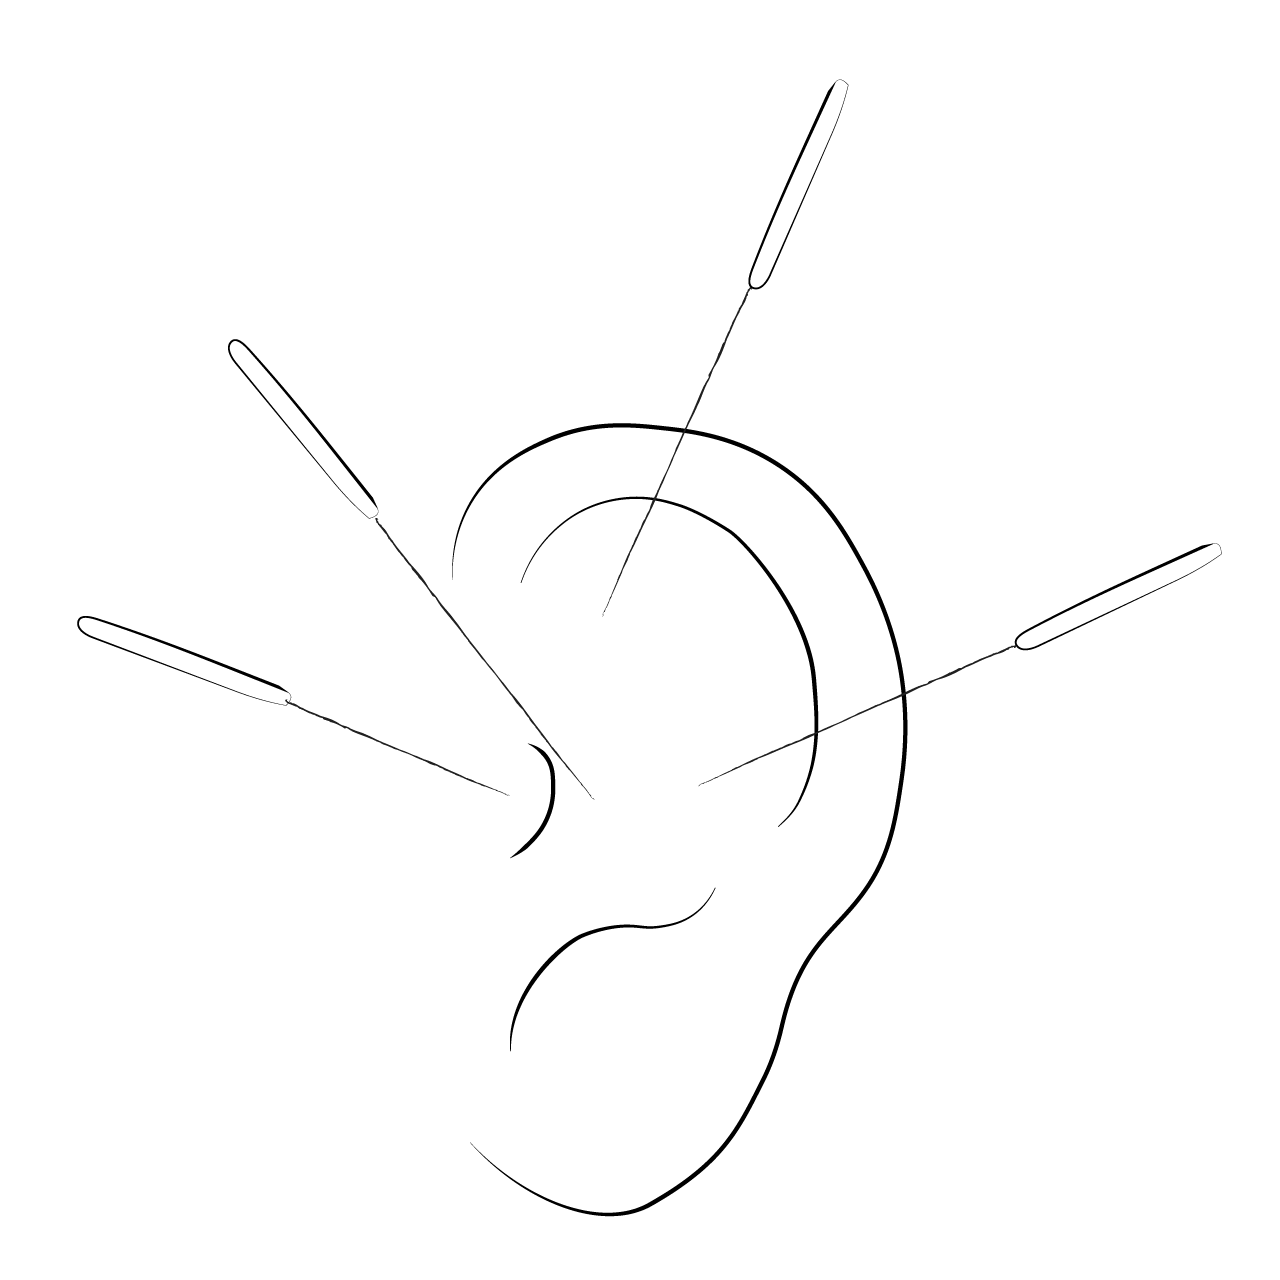 Ear acupuncture illustration